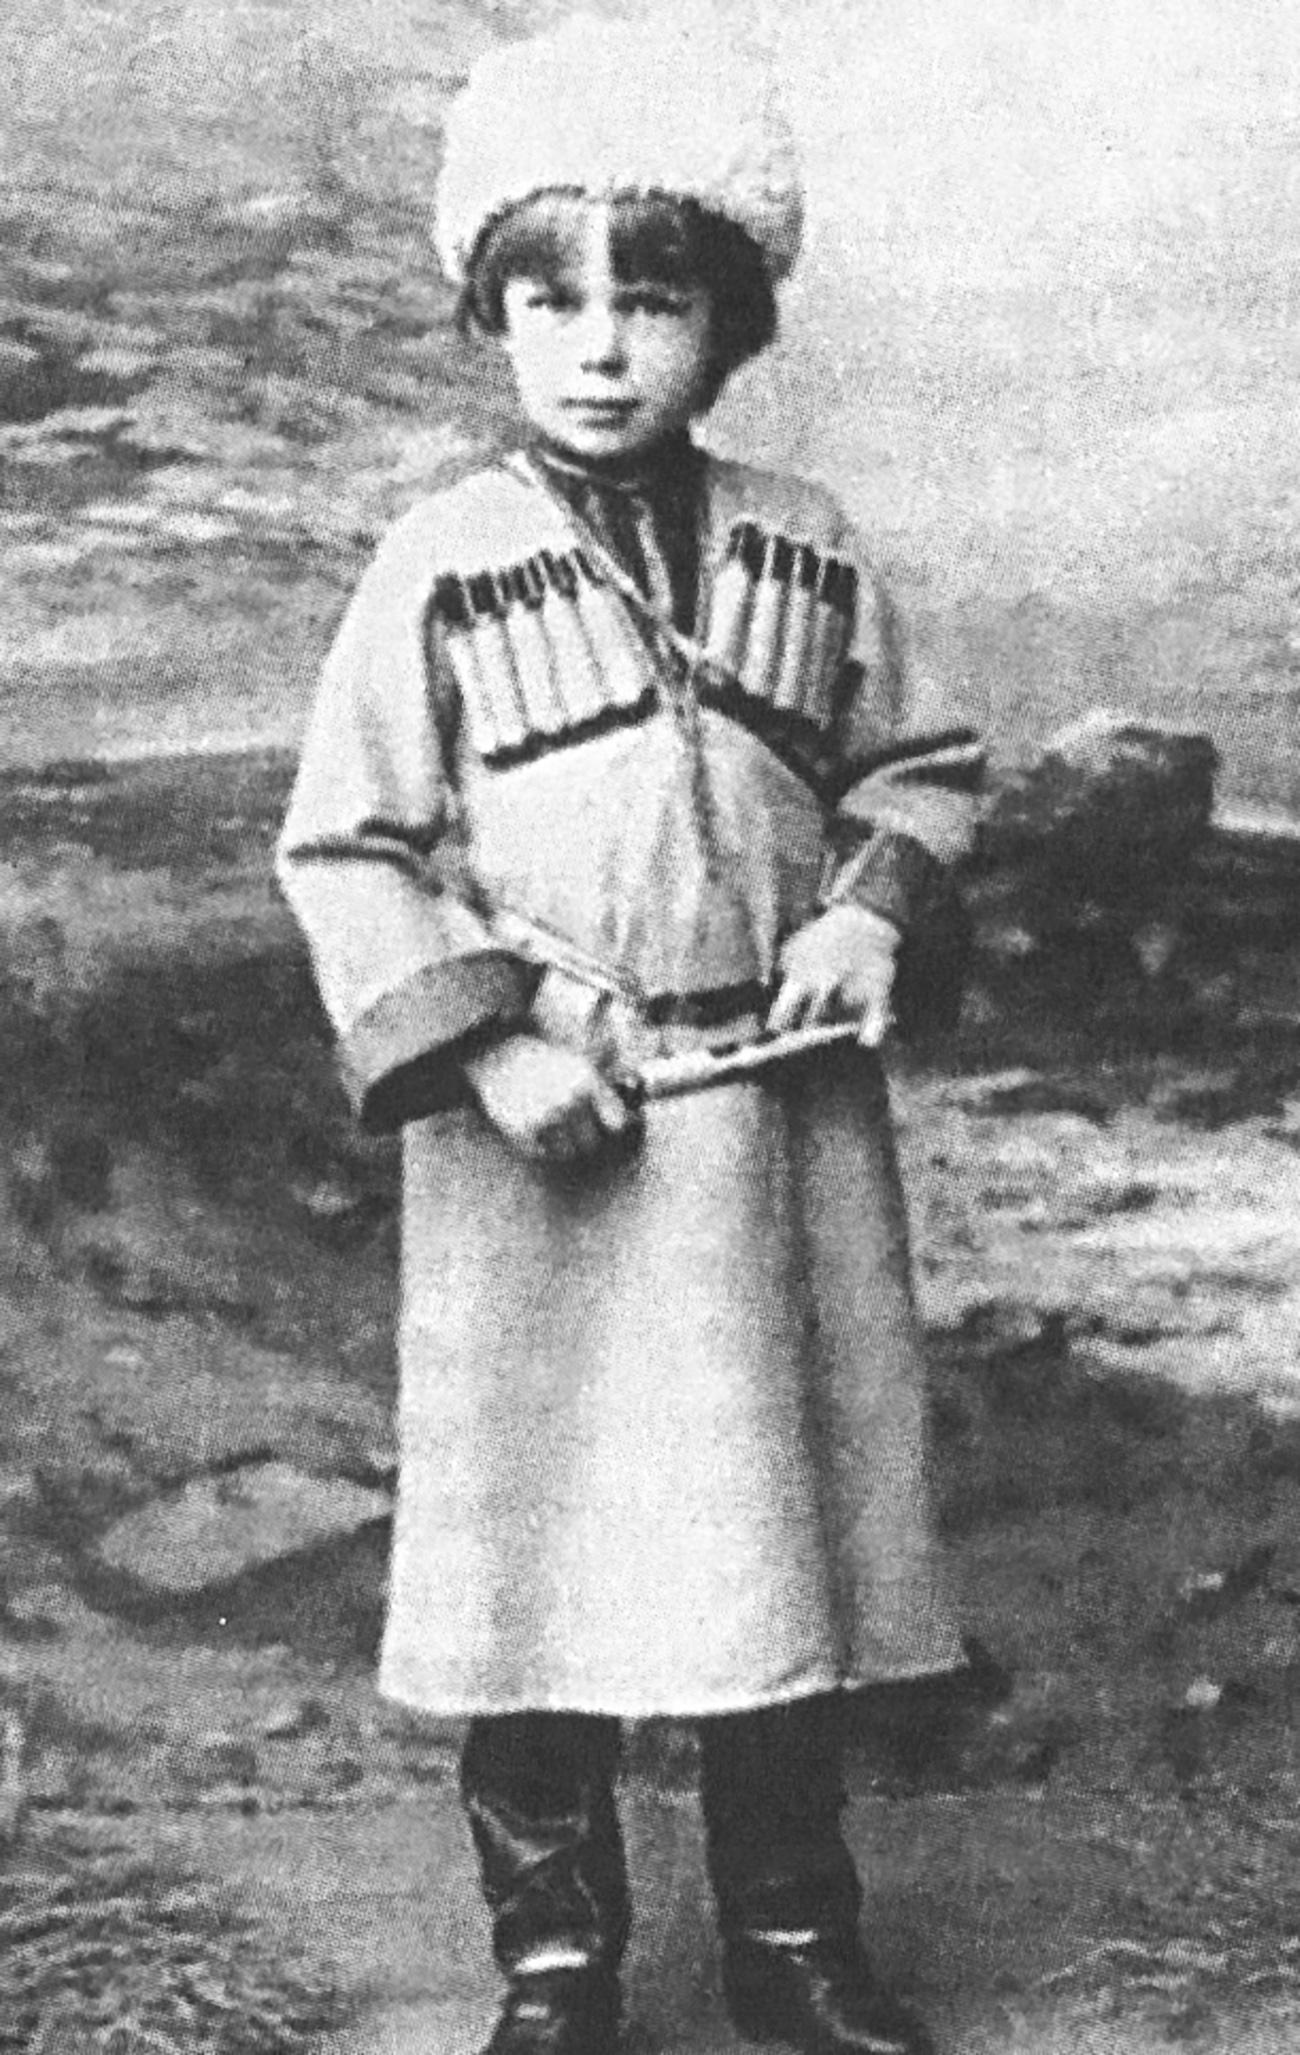 Роман фон Унгерн-Штернберг као дечак. Извор: Архив